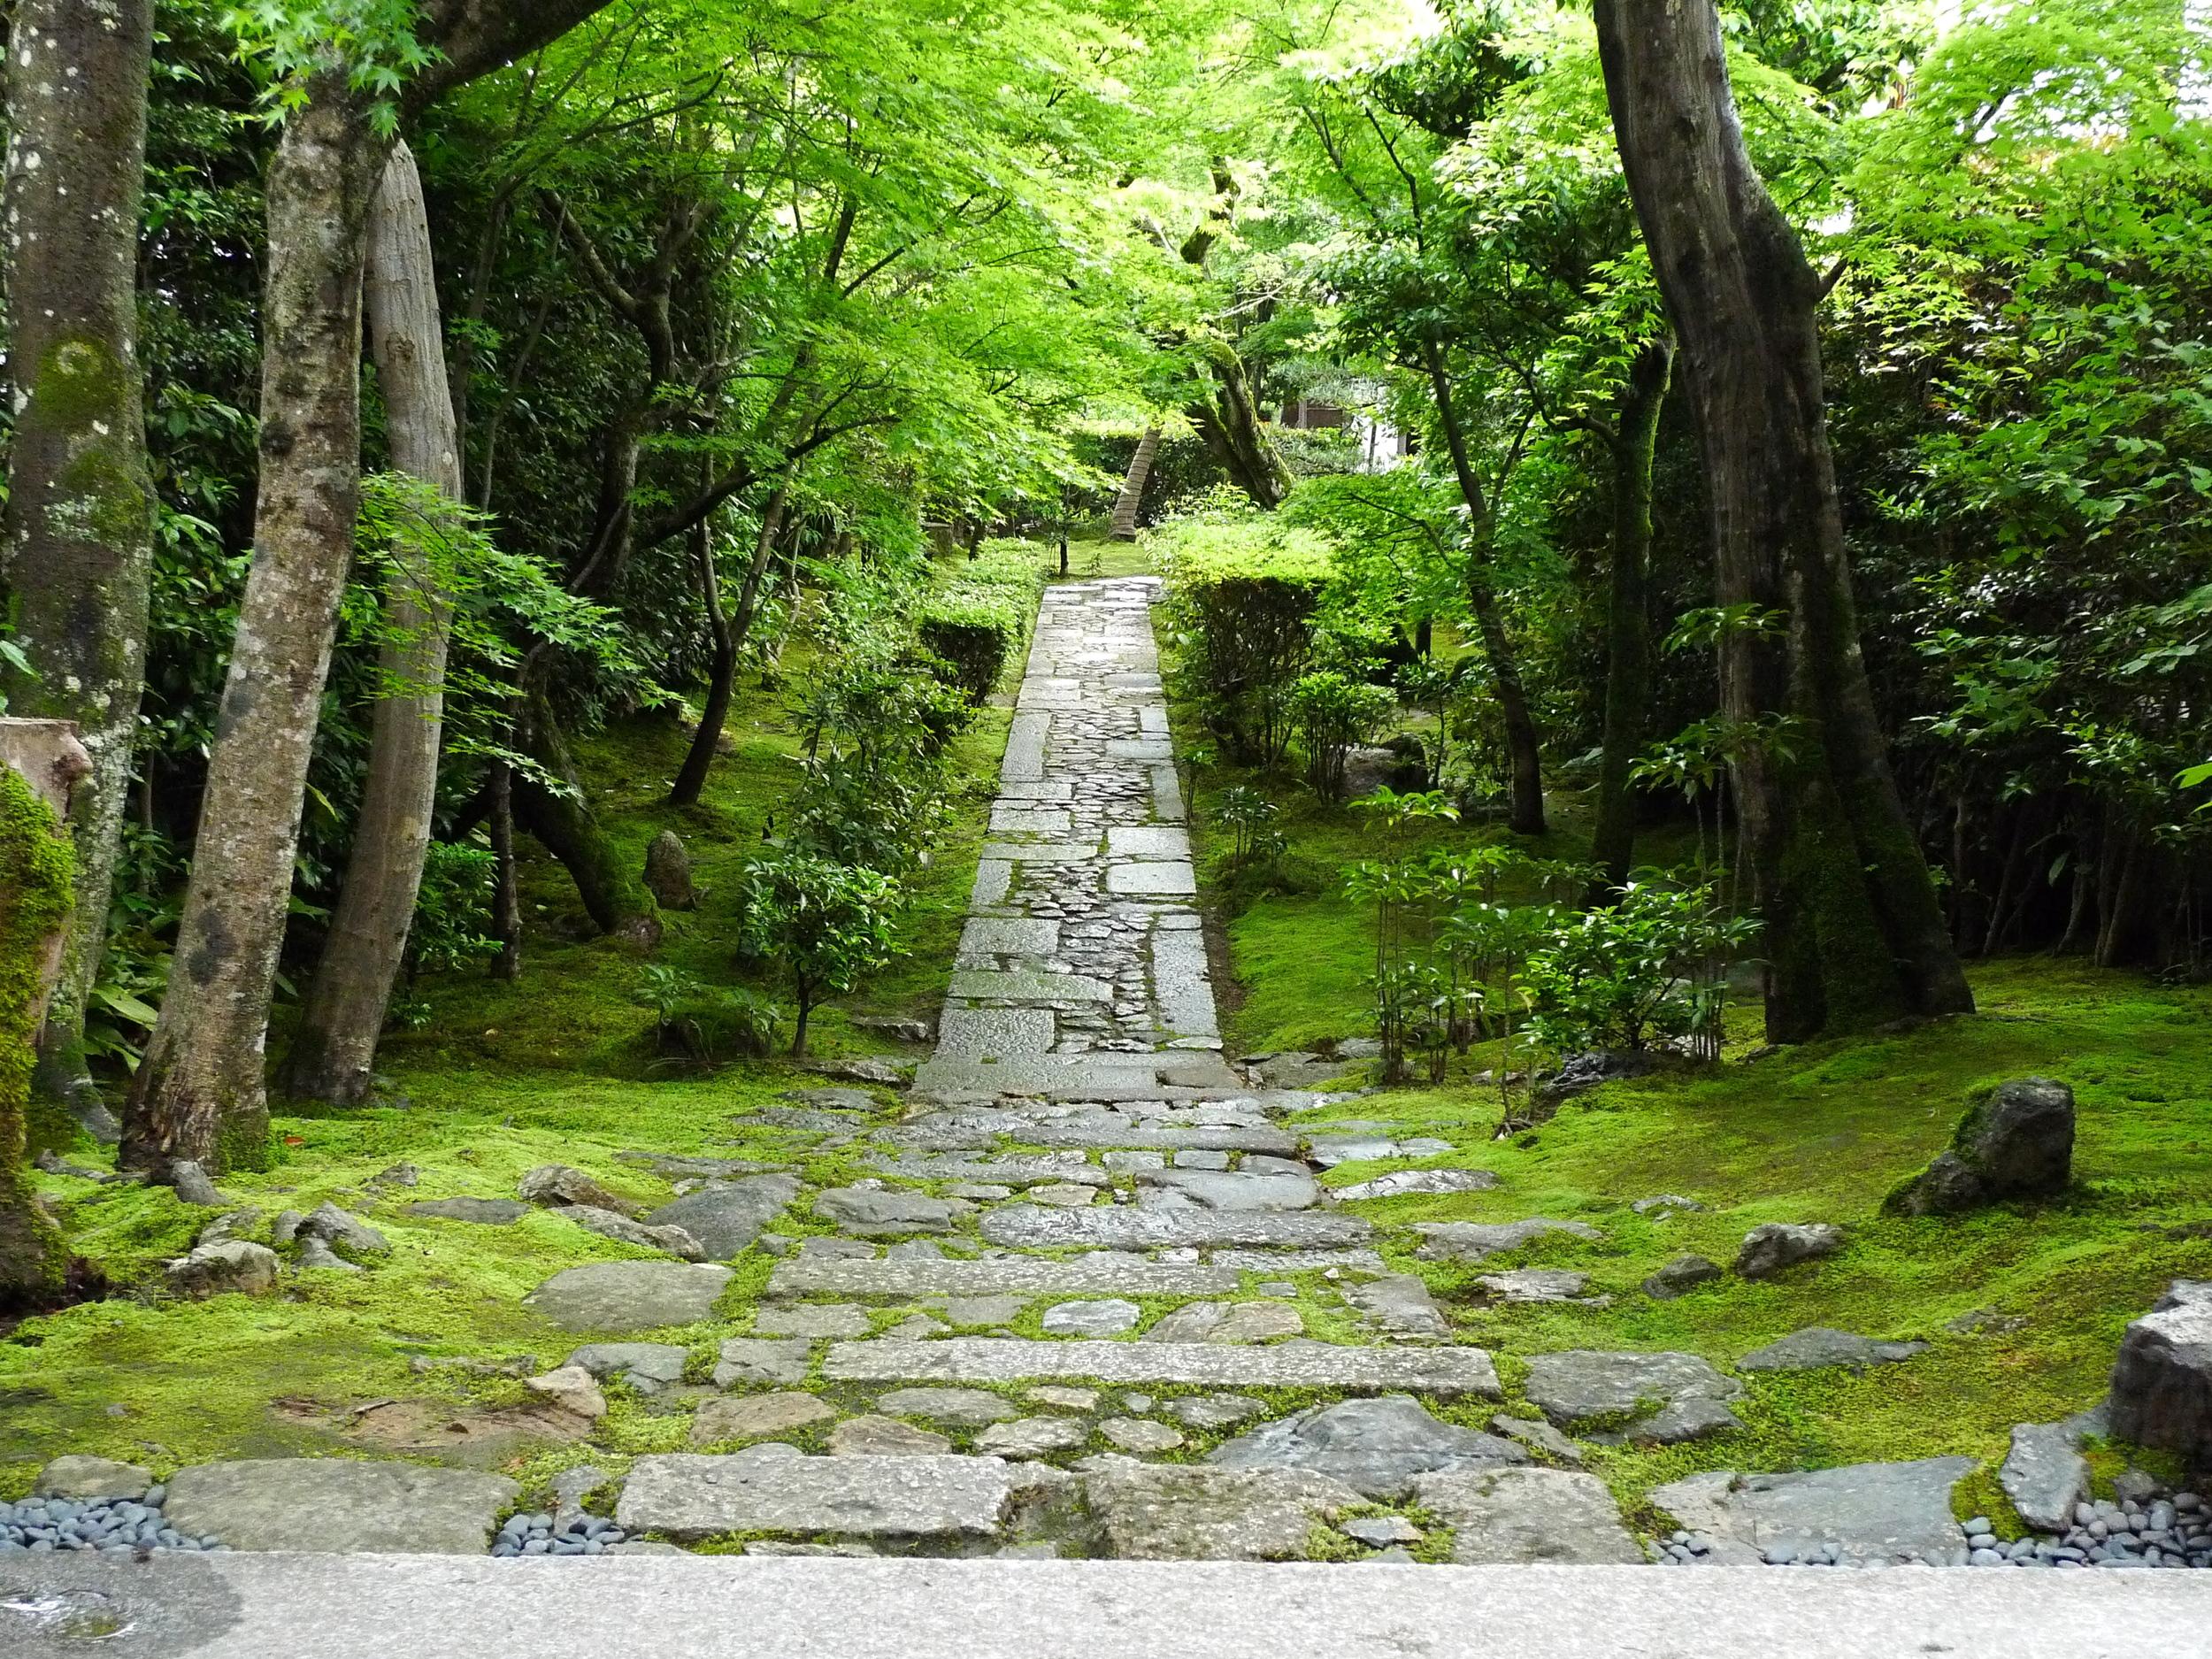 zen-and-the-art-of-piano-david-michael-wolff-zen-path